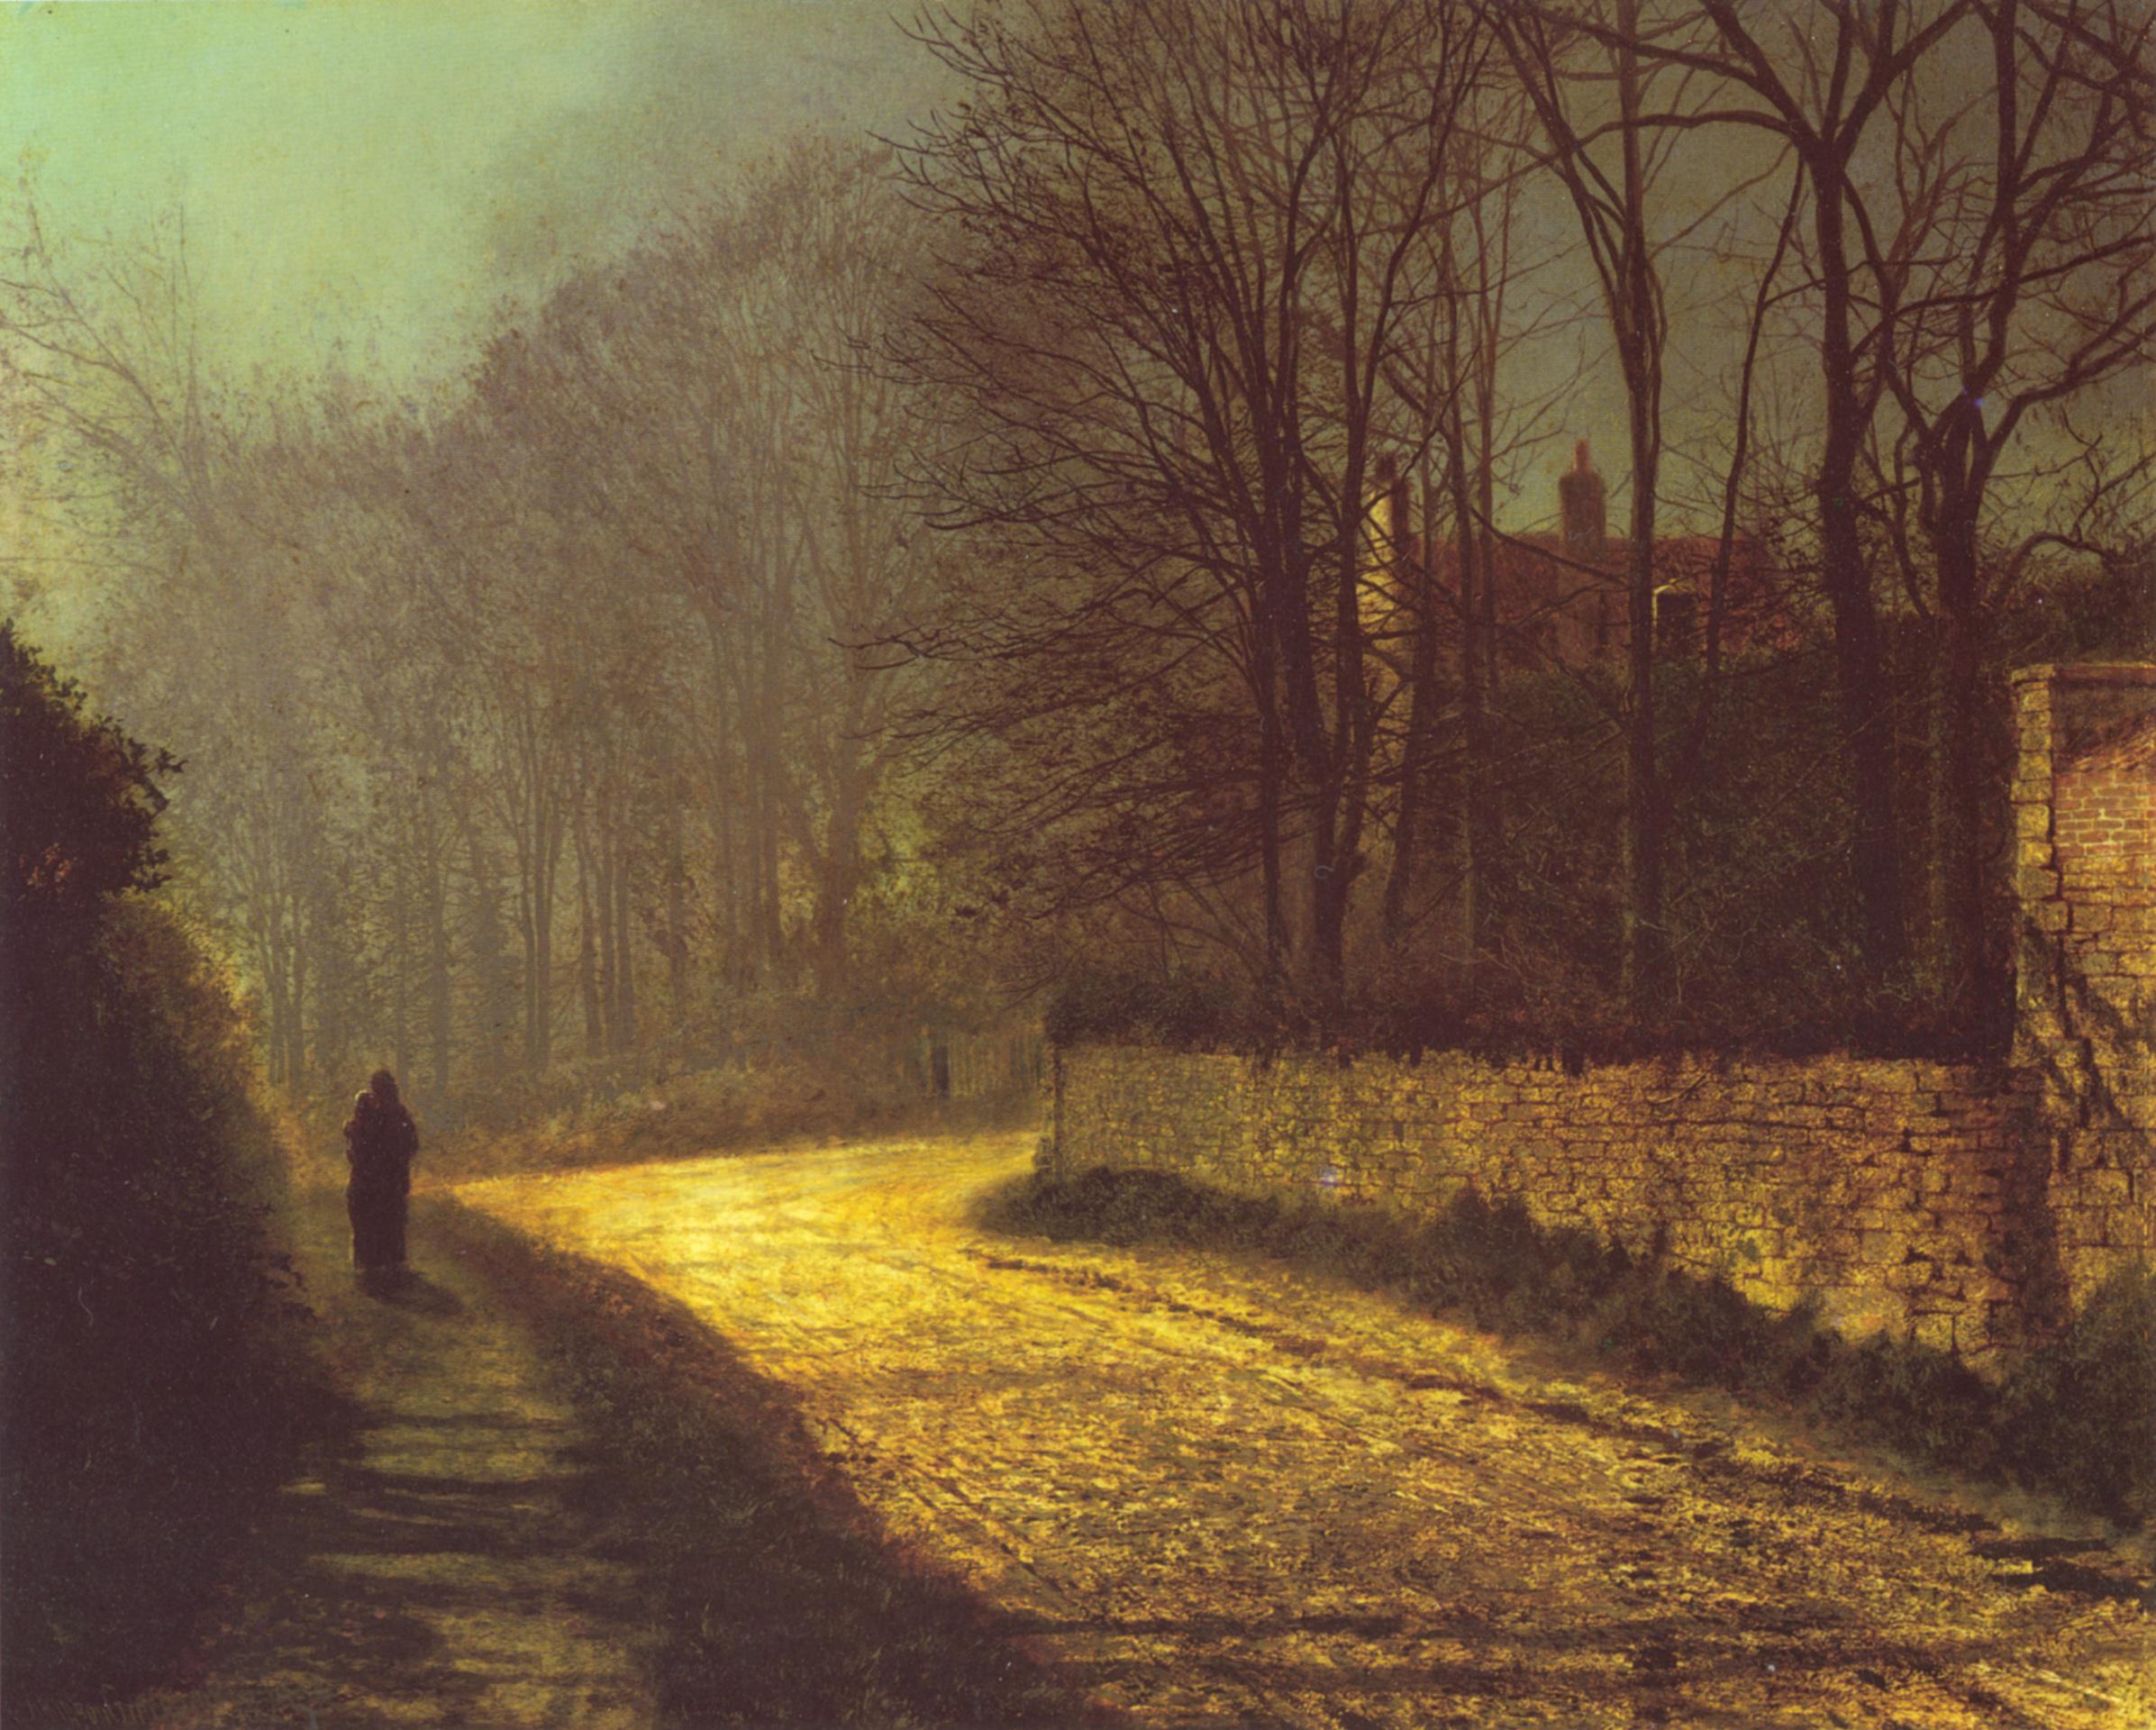 Wallpaper Classic Art Classical Art John Atkinson Grimshaw The